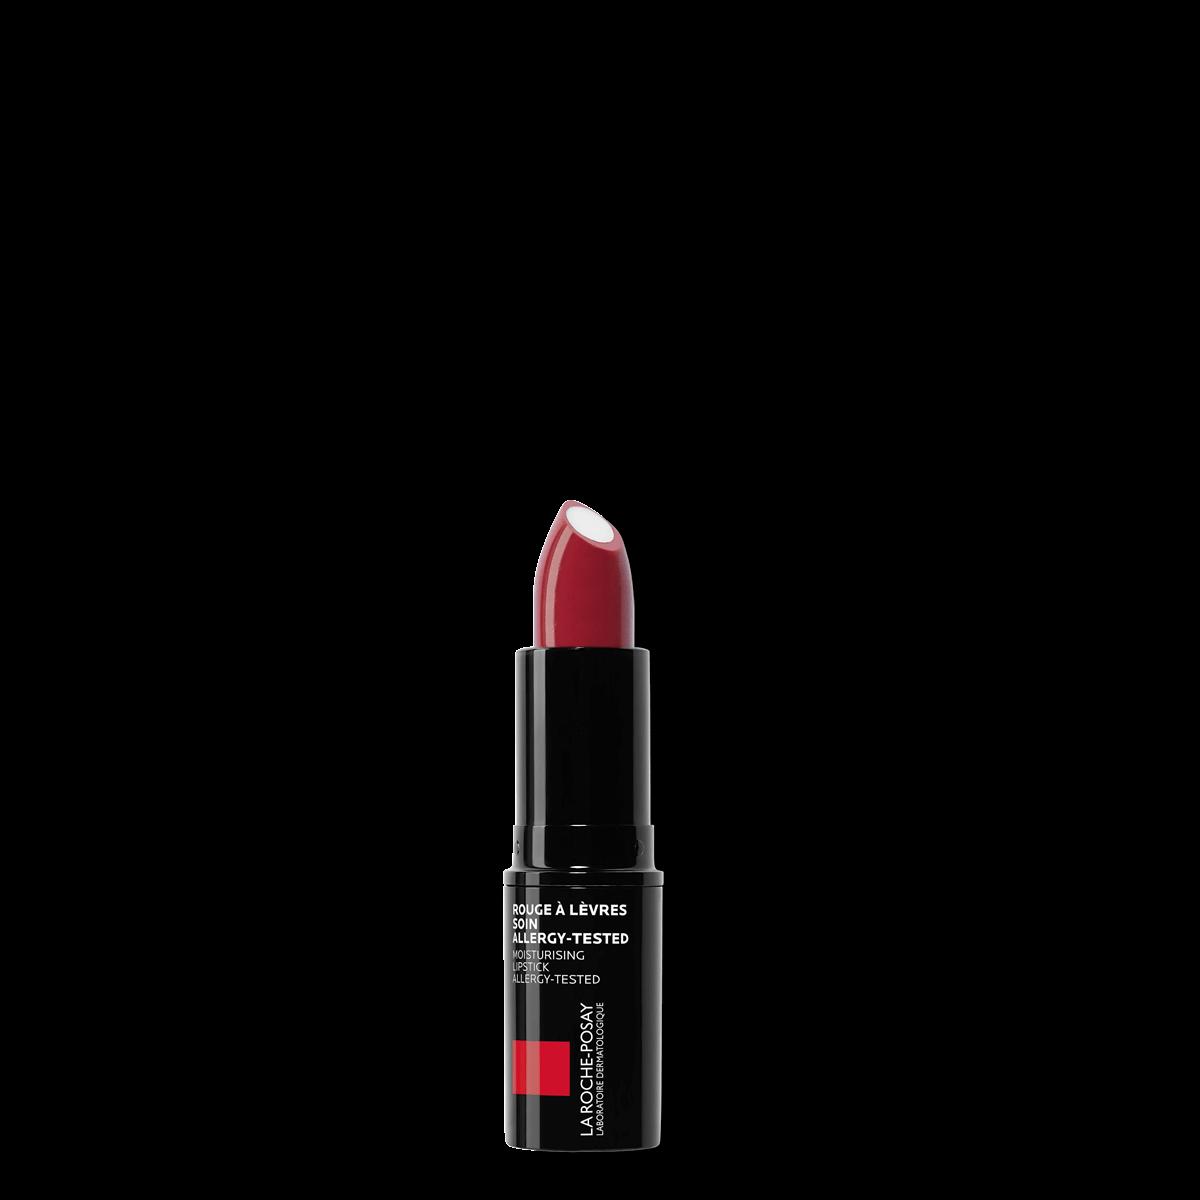 La Roche Posay Sensitive Toleriane Make up NOVALIP_158Cassisnocturne 3